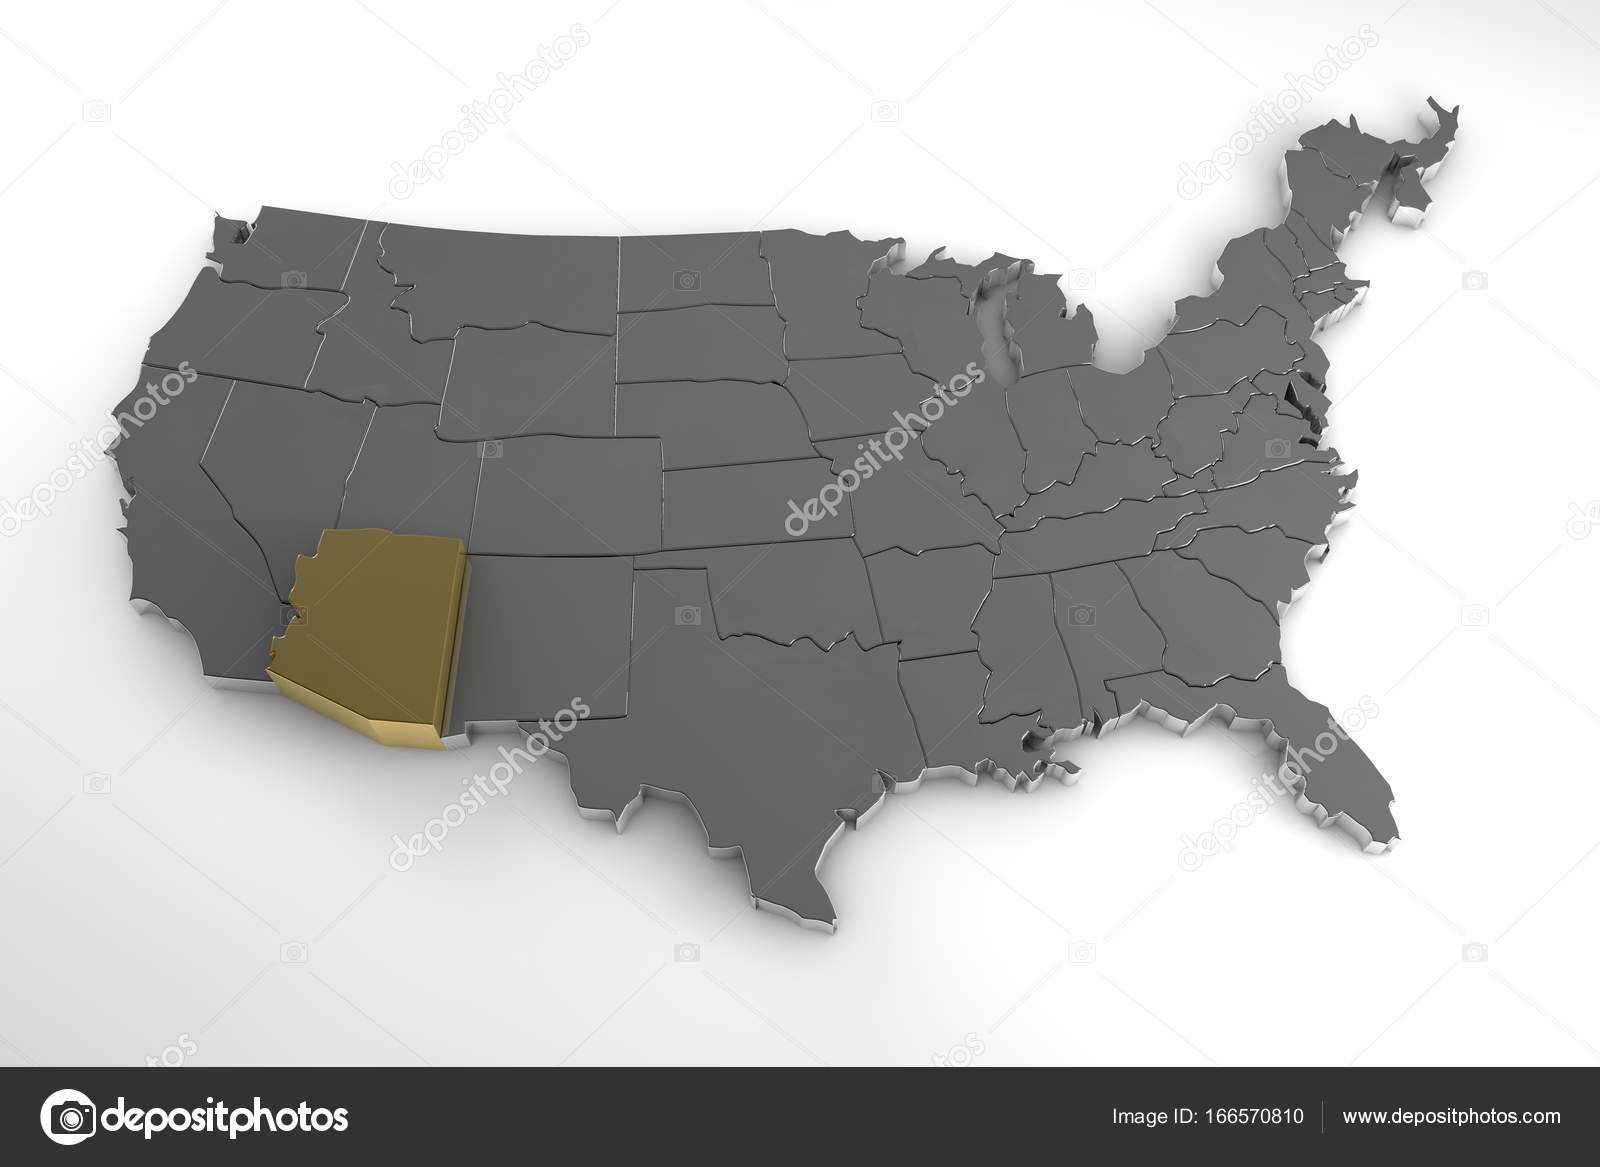 3d Map Of Arizona.United States Of America 3d Metallic Map Whith Arizona State